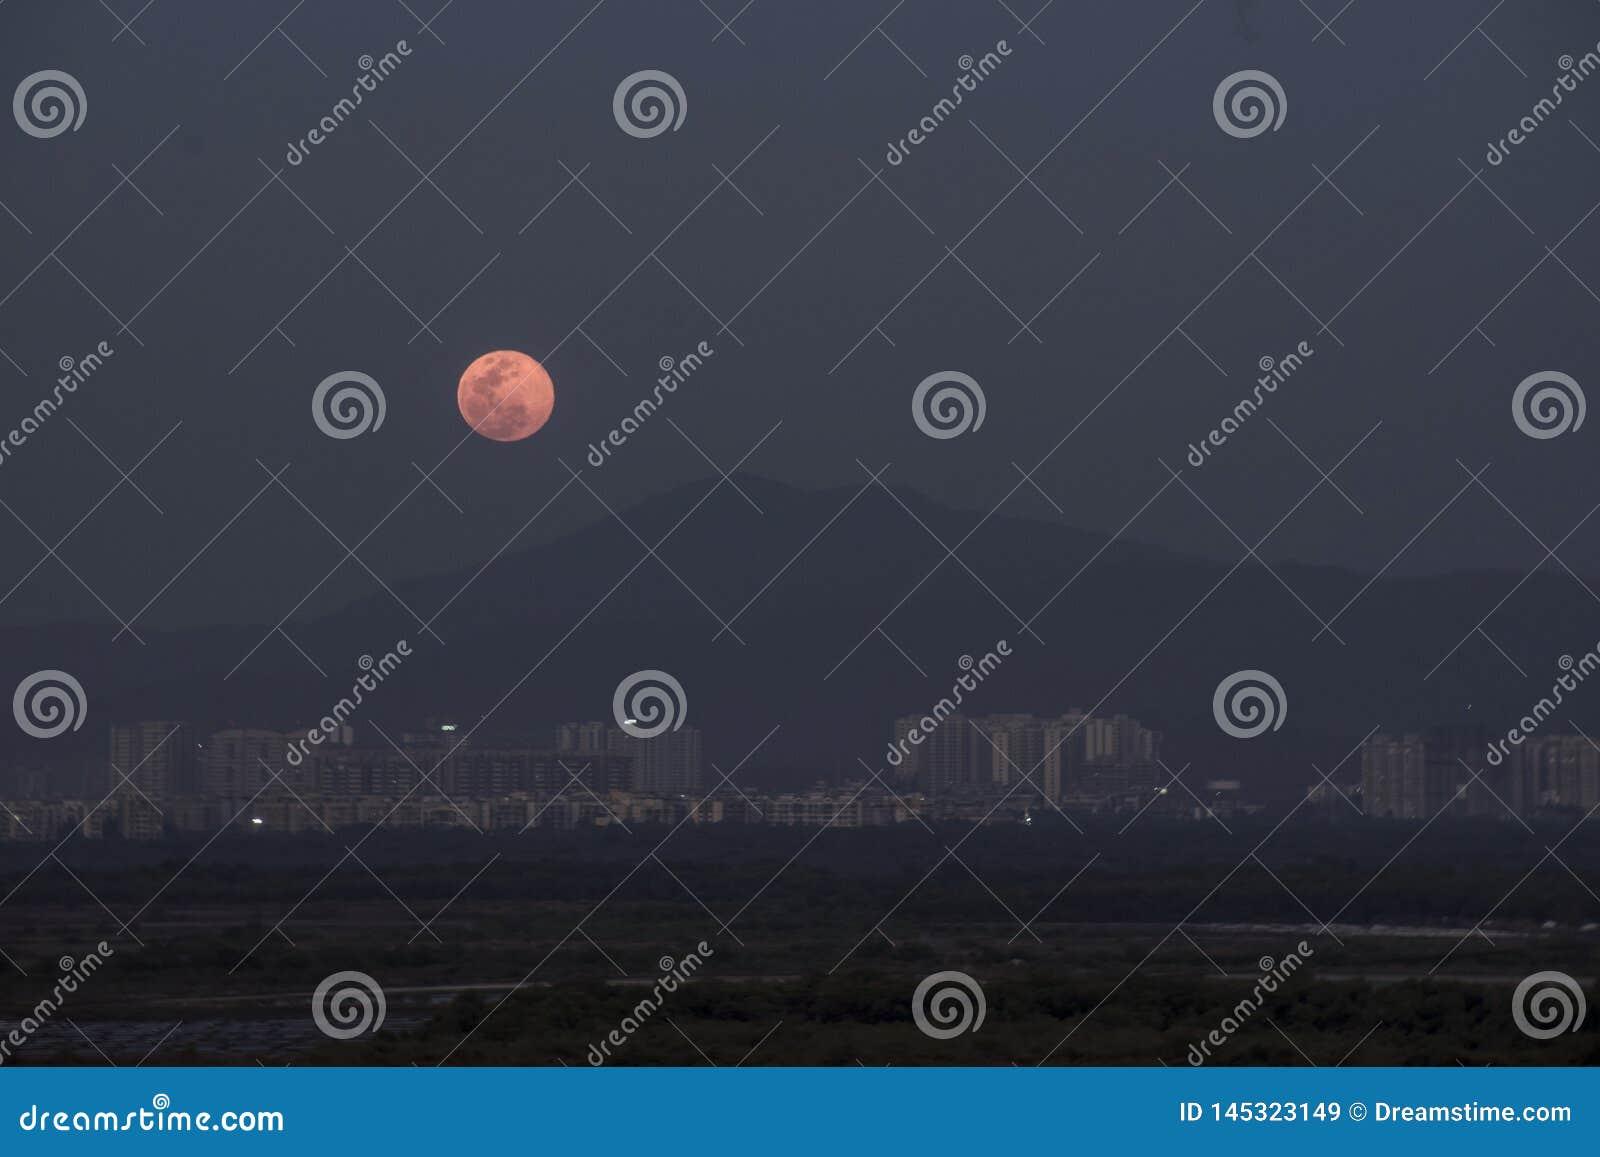 Розовая луна в месяце в апреле